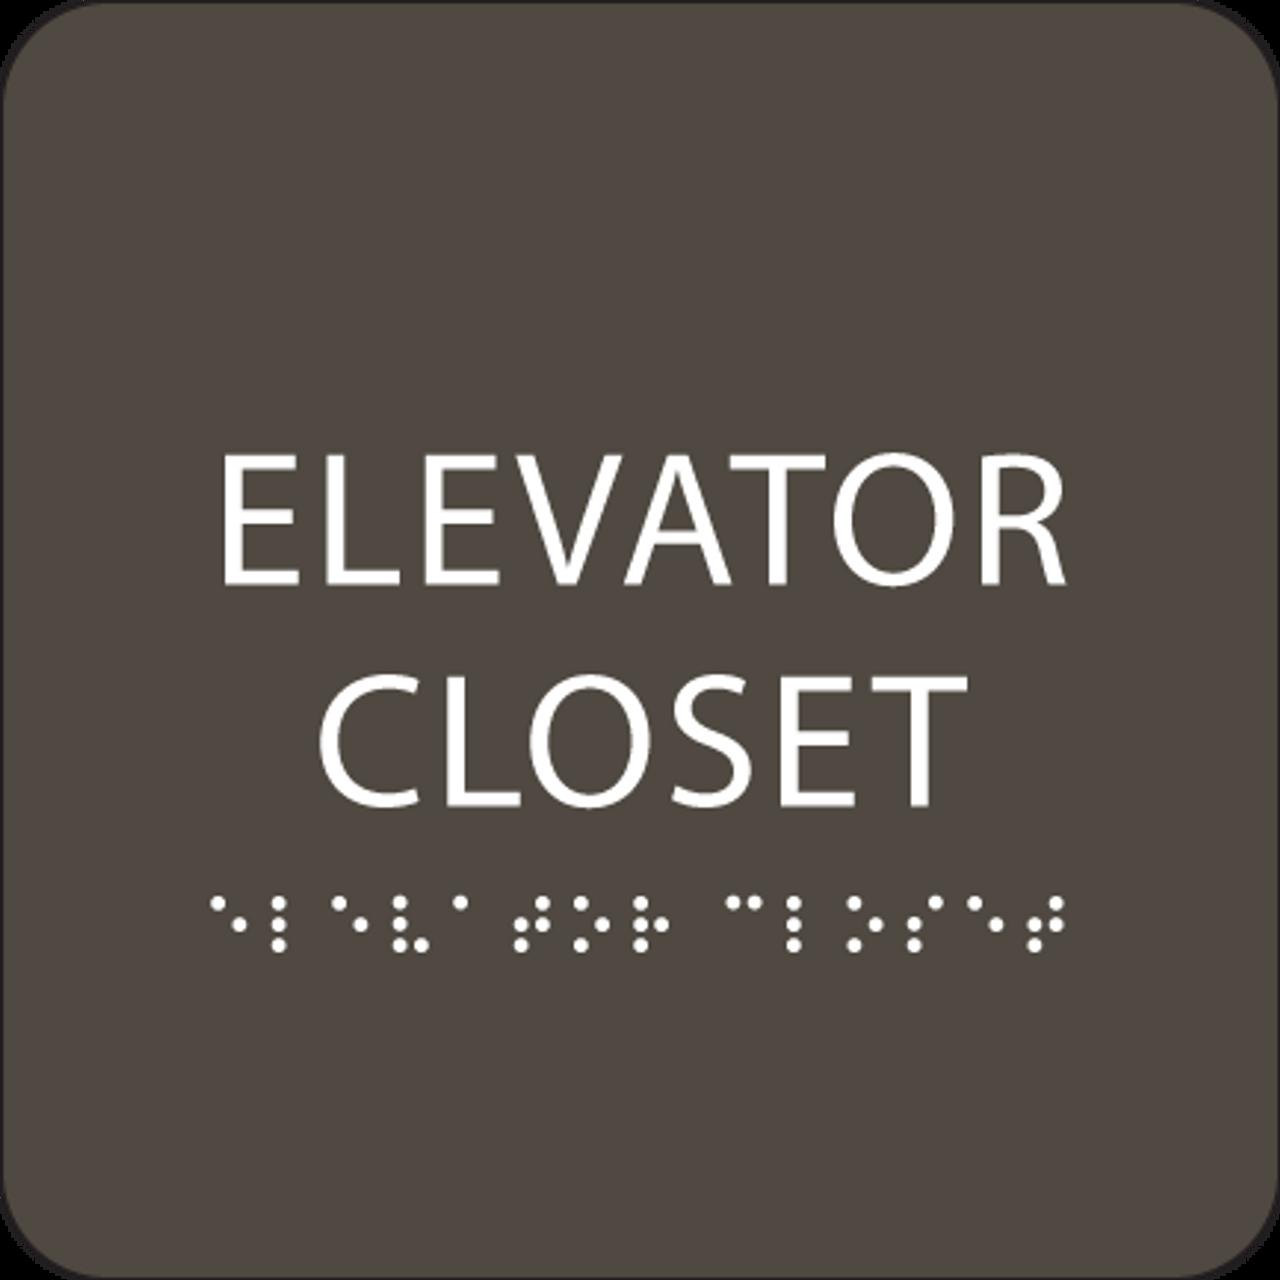 "Elevator Closet ADA Sign - 6"" x 6"""